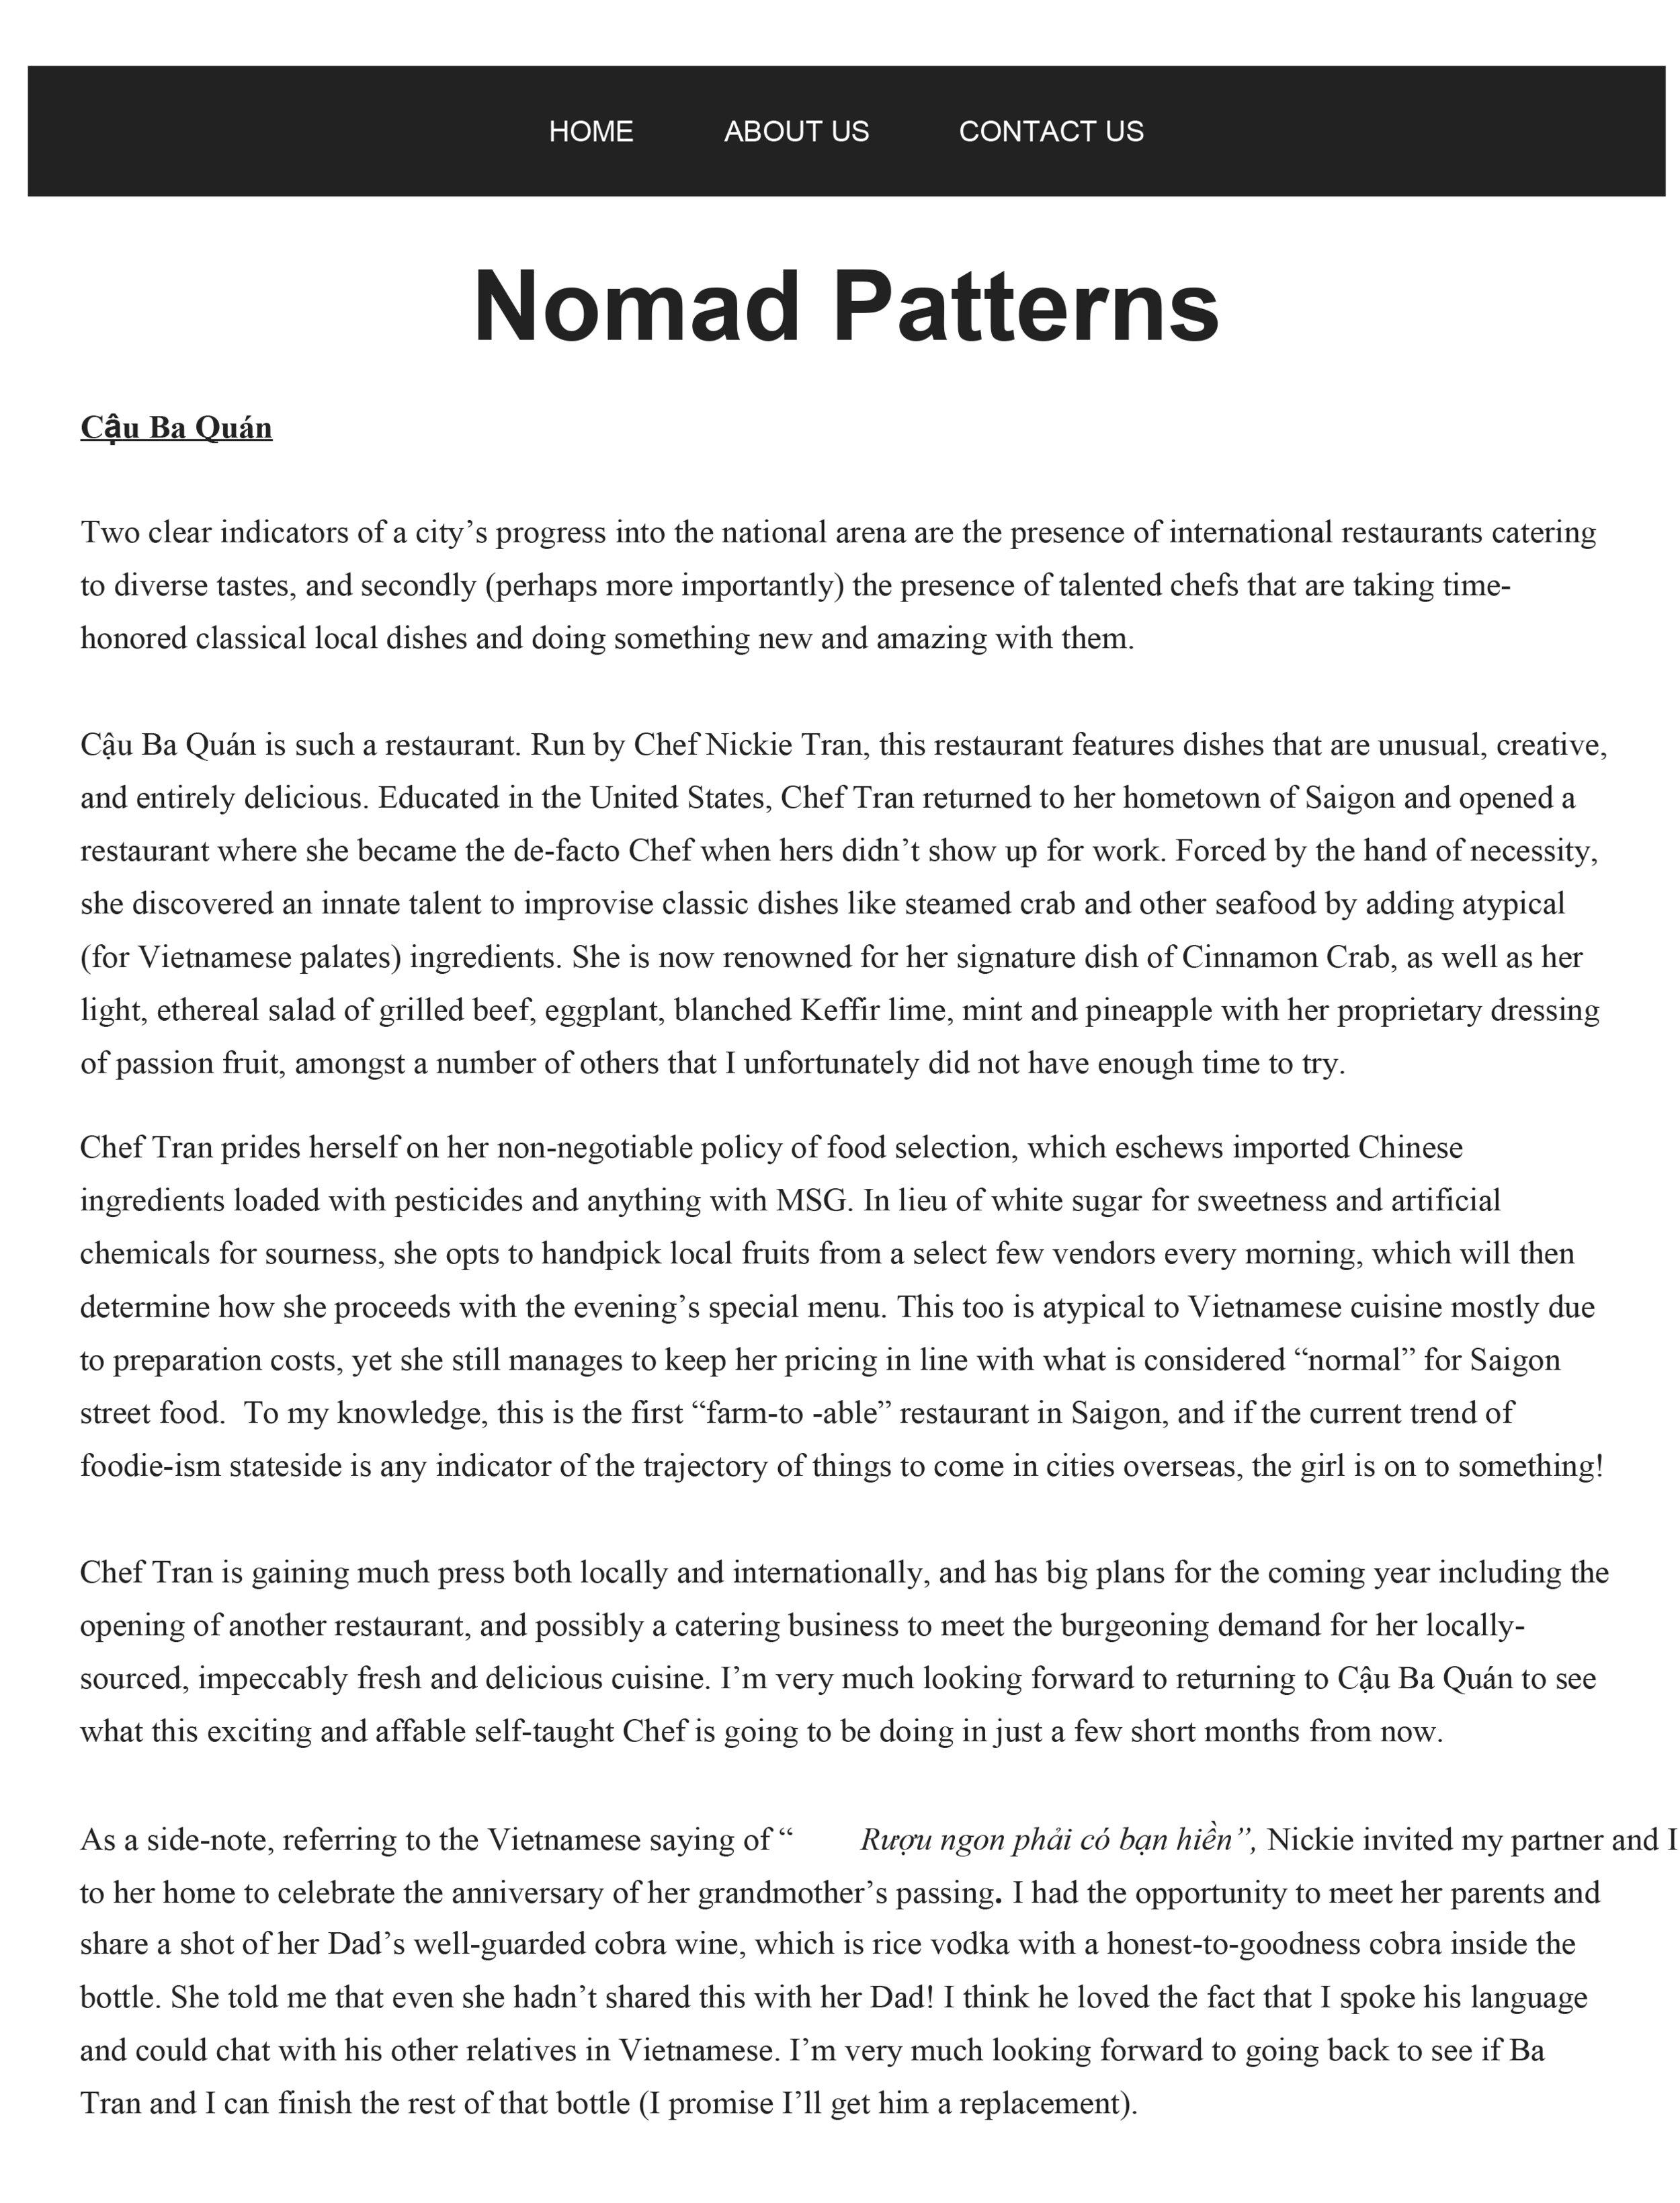 Nomad Pattern.jpg